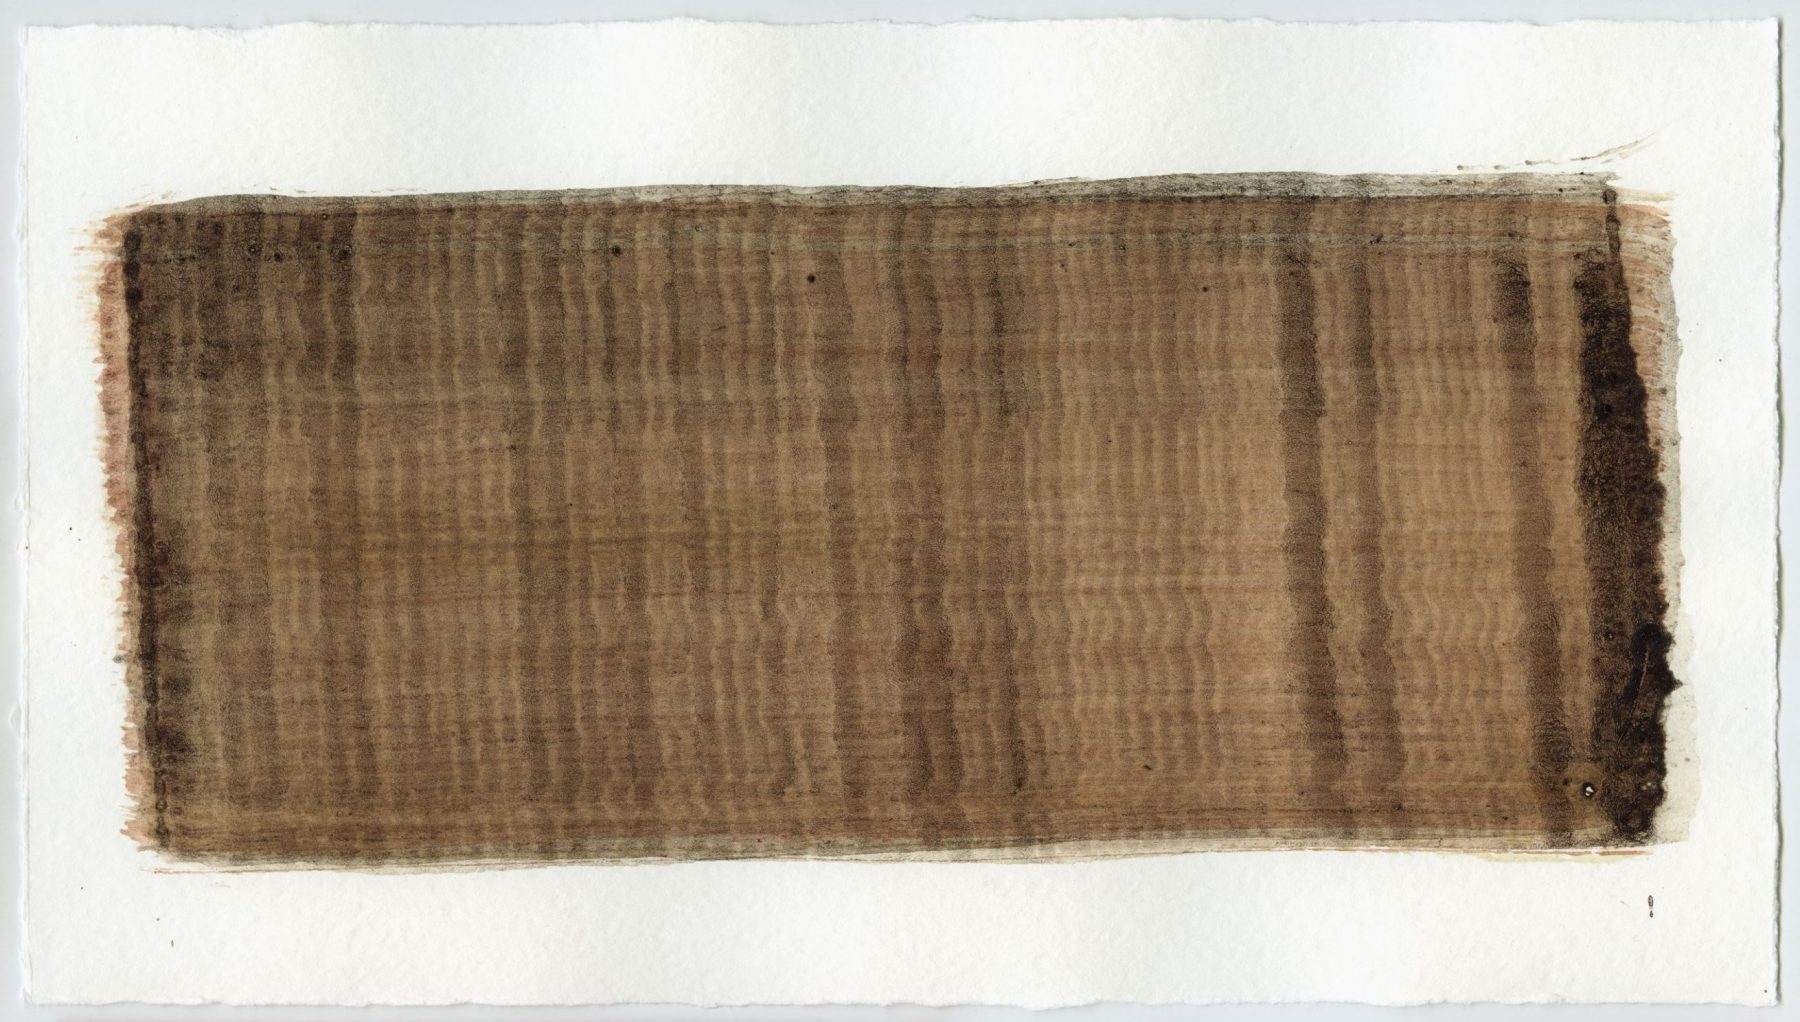 Brush stroke no. 79 - Selfmade pigment: Mortelse oker gebrand, Slingerpad bruin